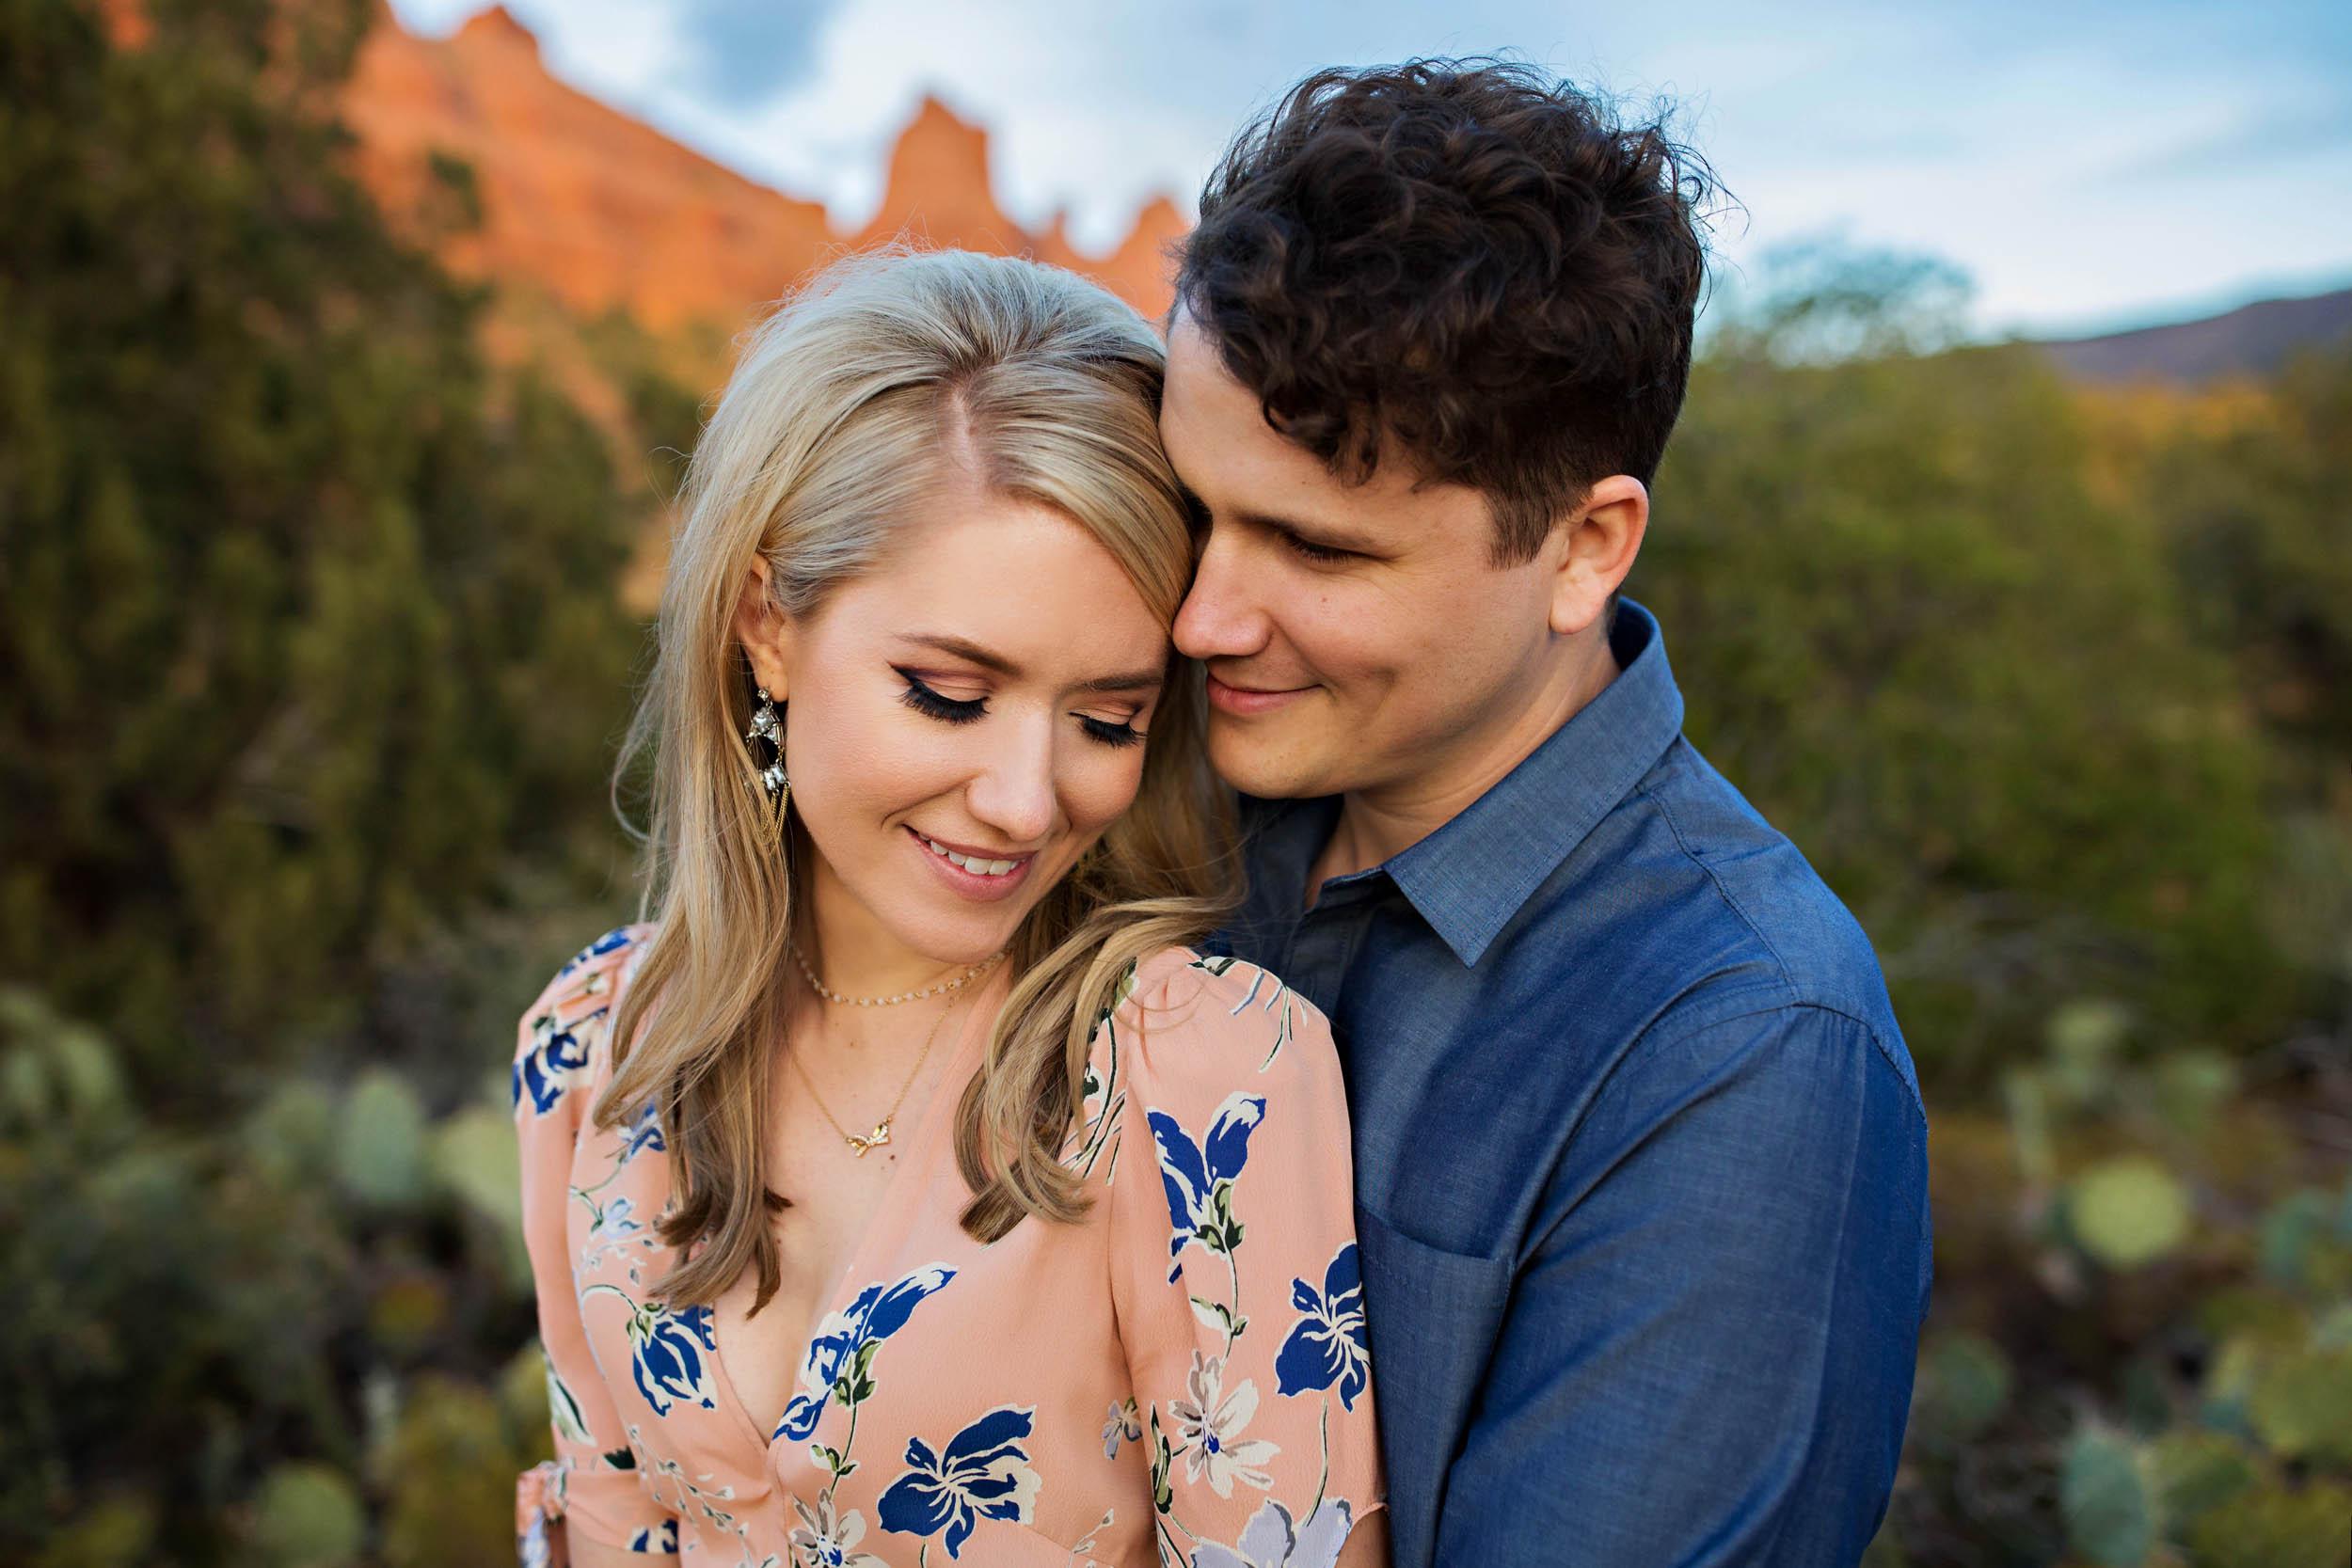 engagement-fiance-20.jpg